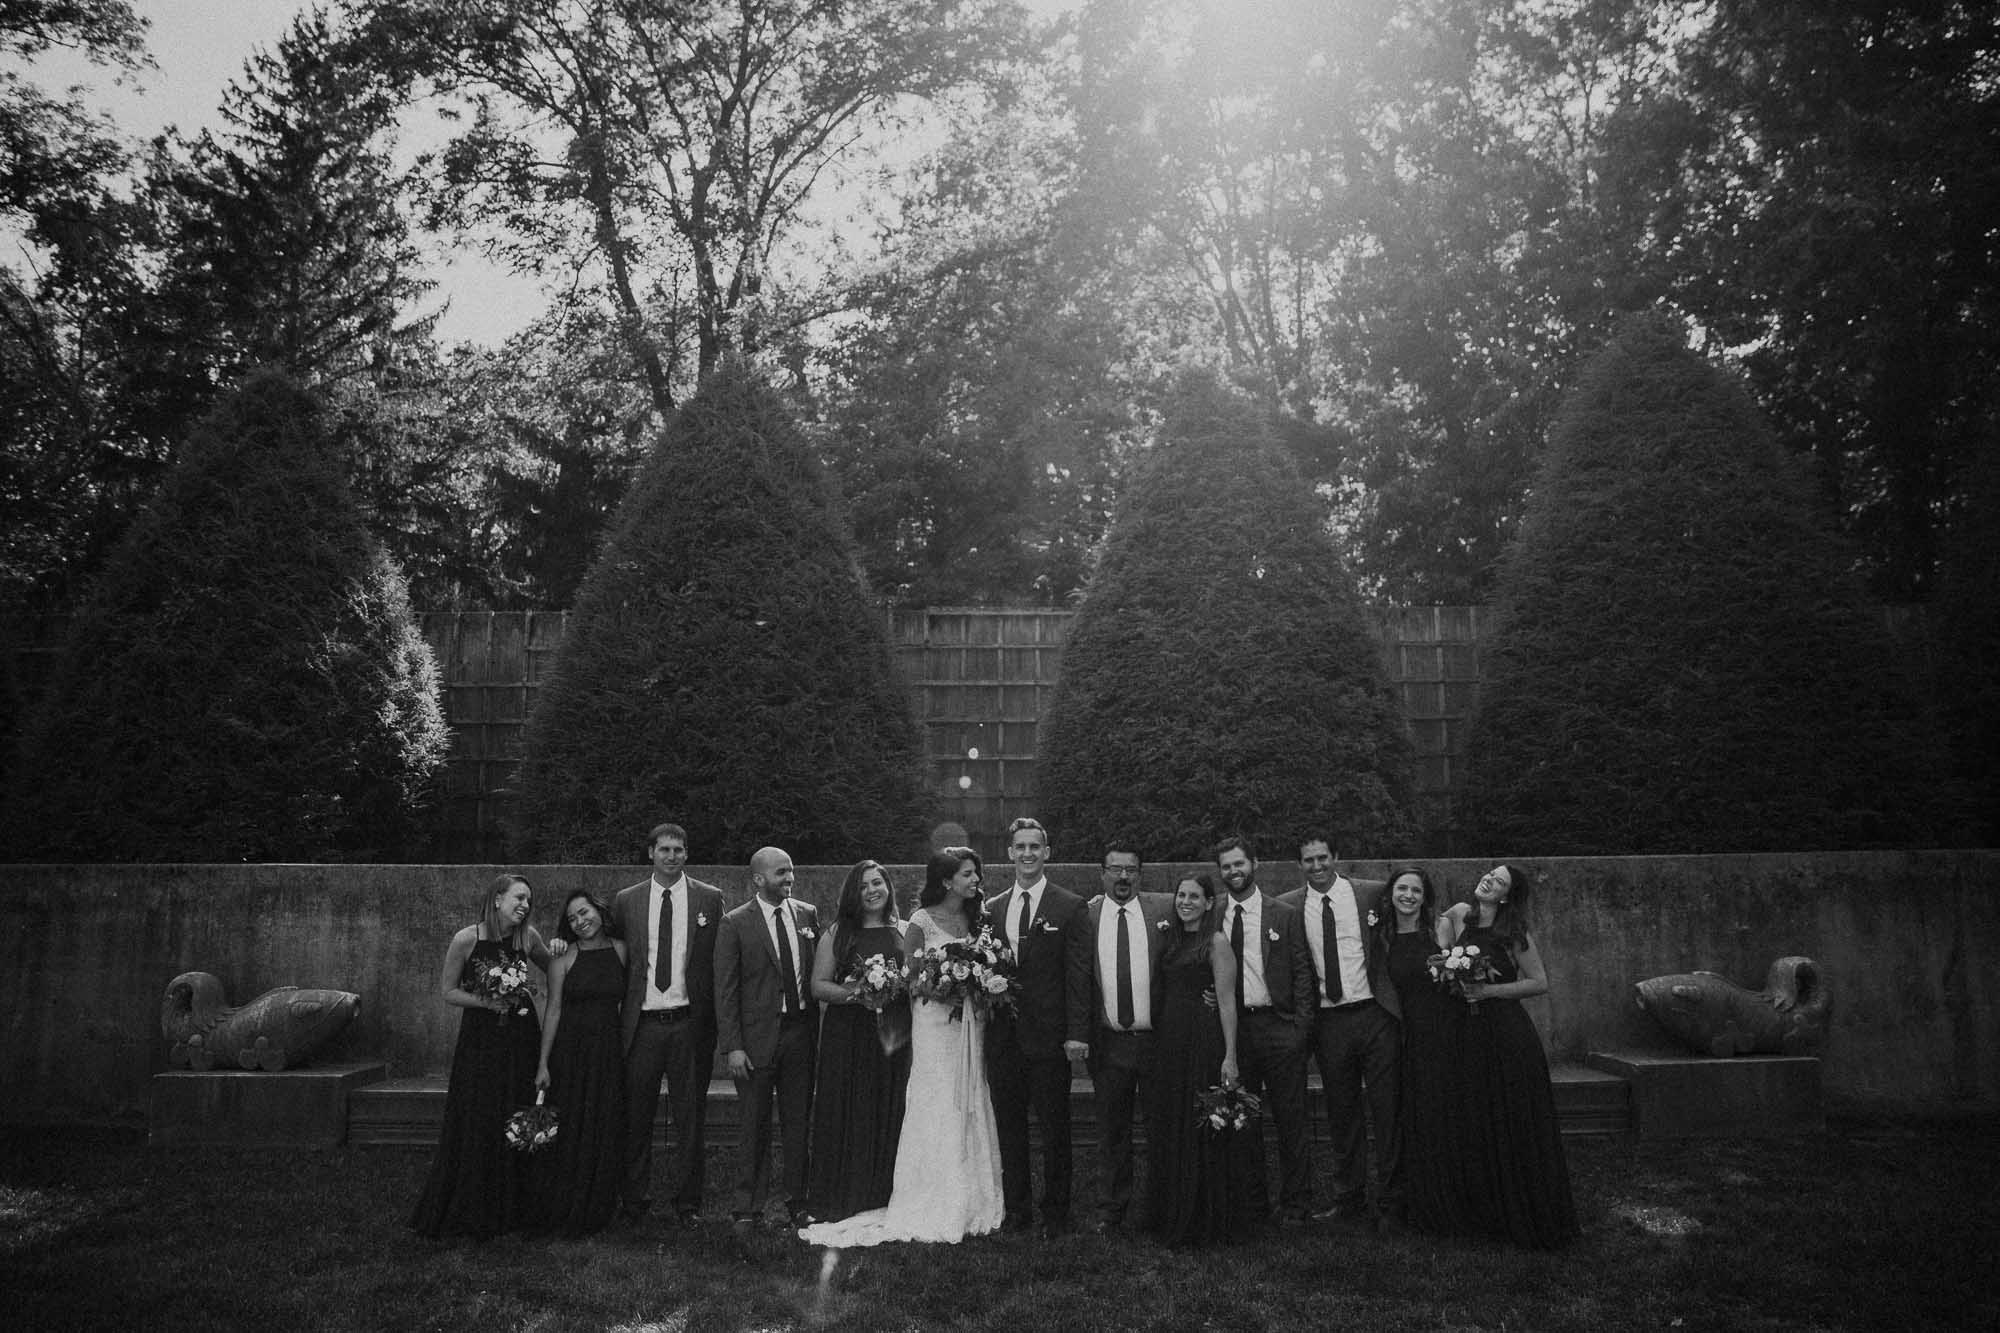 champaign_il_wedding_photography-0461.jpg